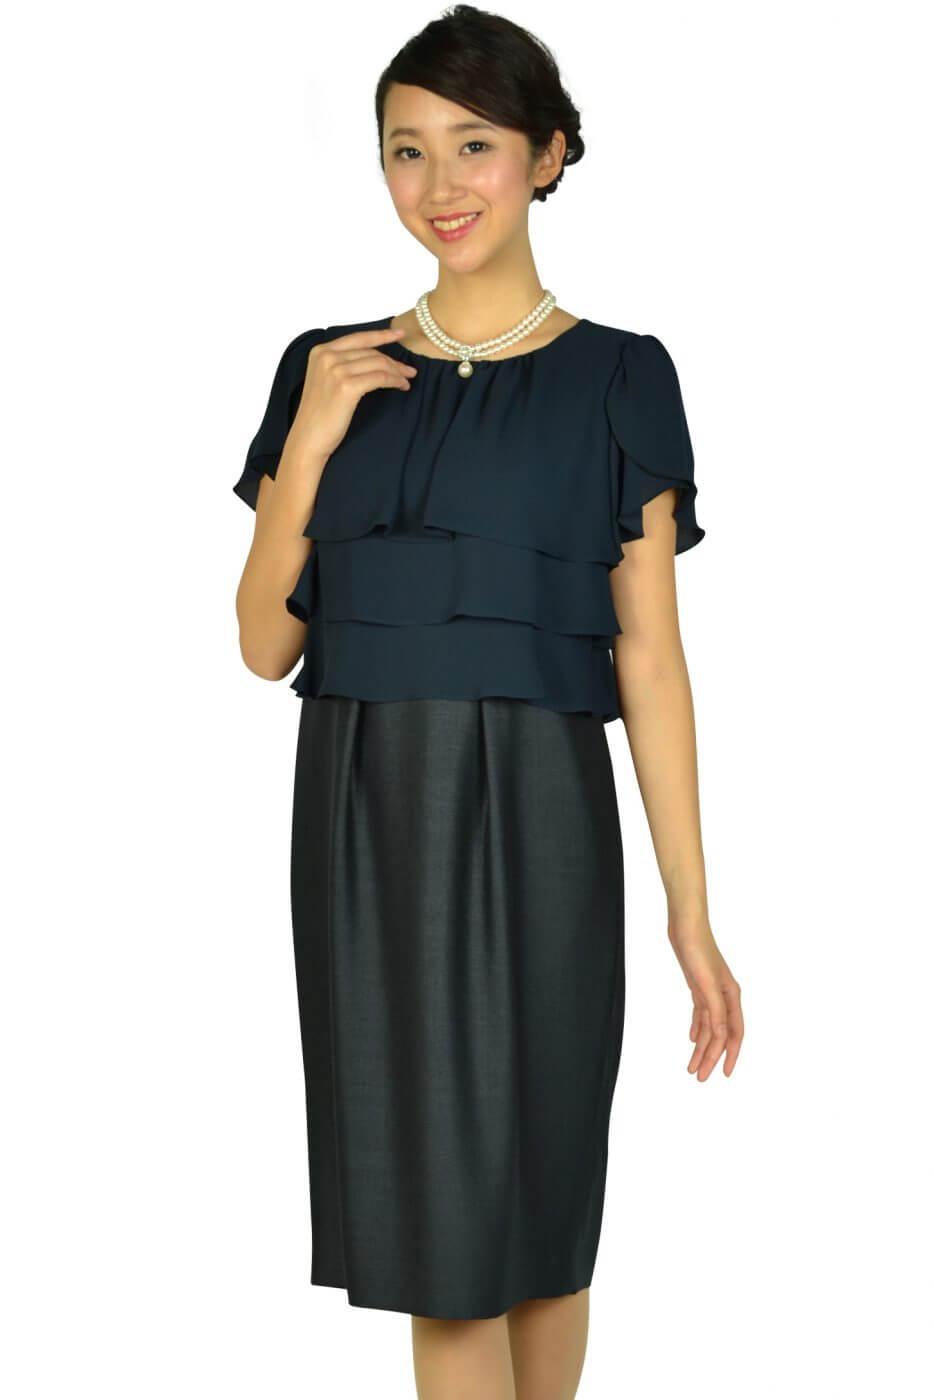 443bb17ca213c ドレス デコ(DRESS DECO) フリルトップネイビードレス